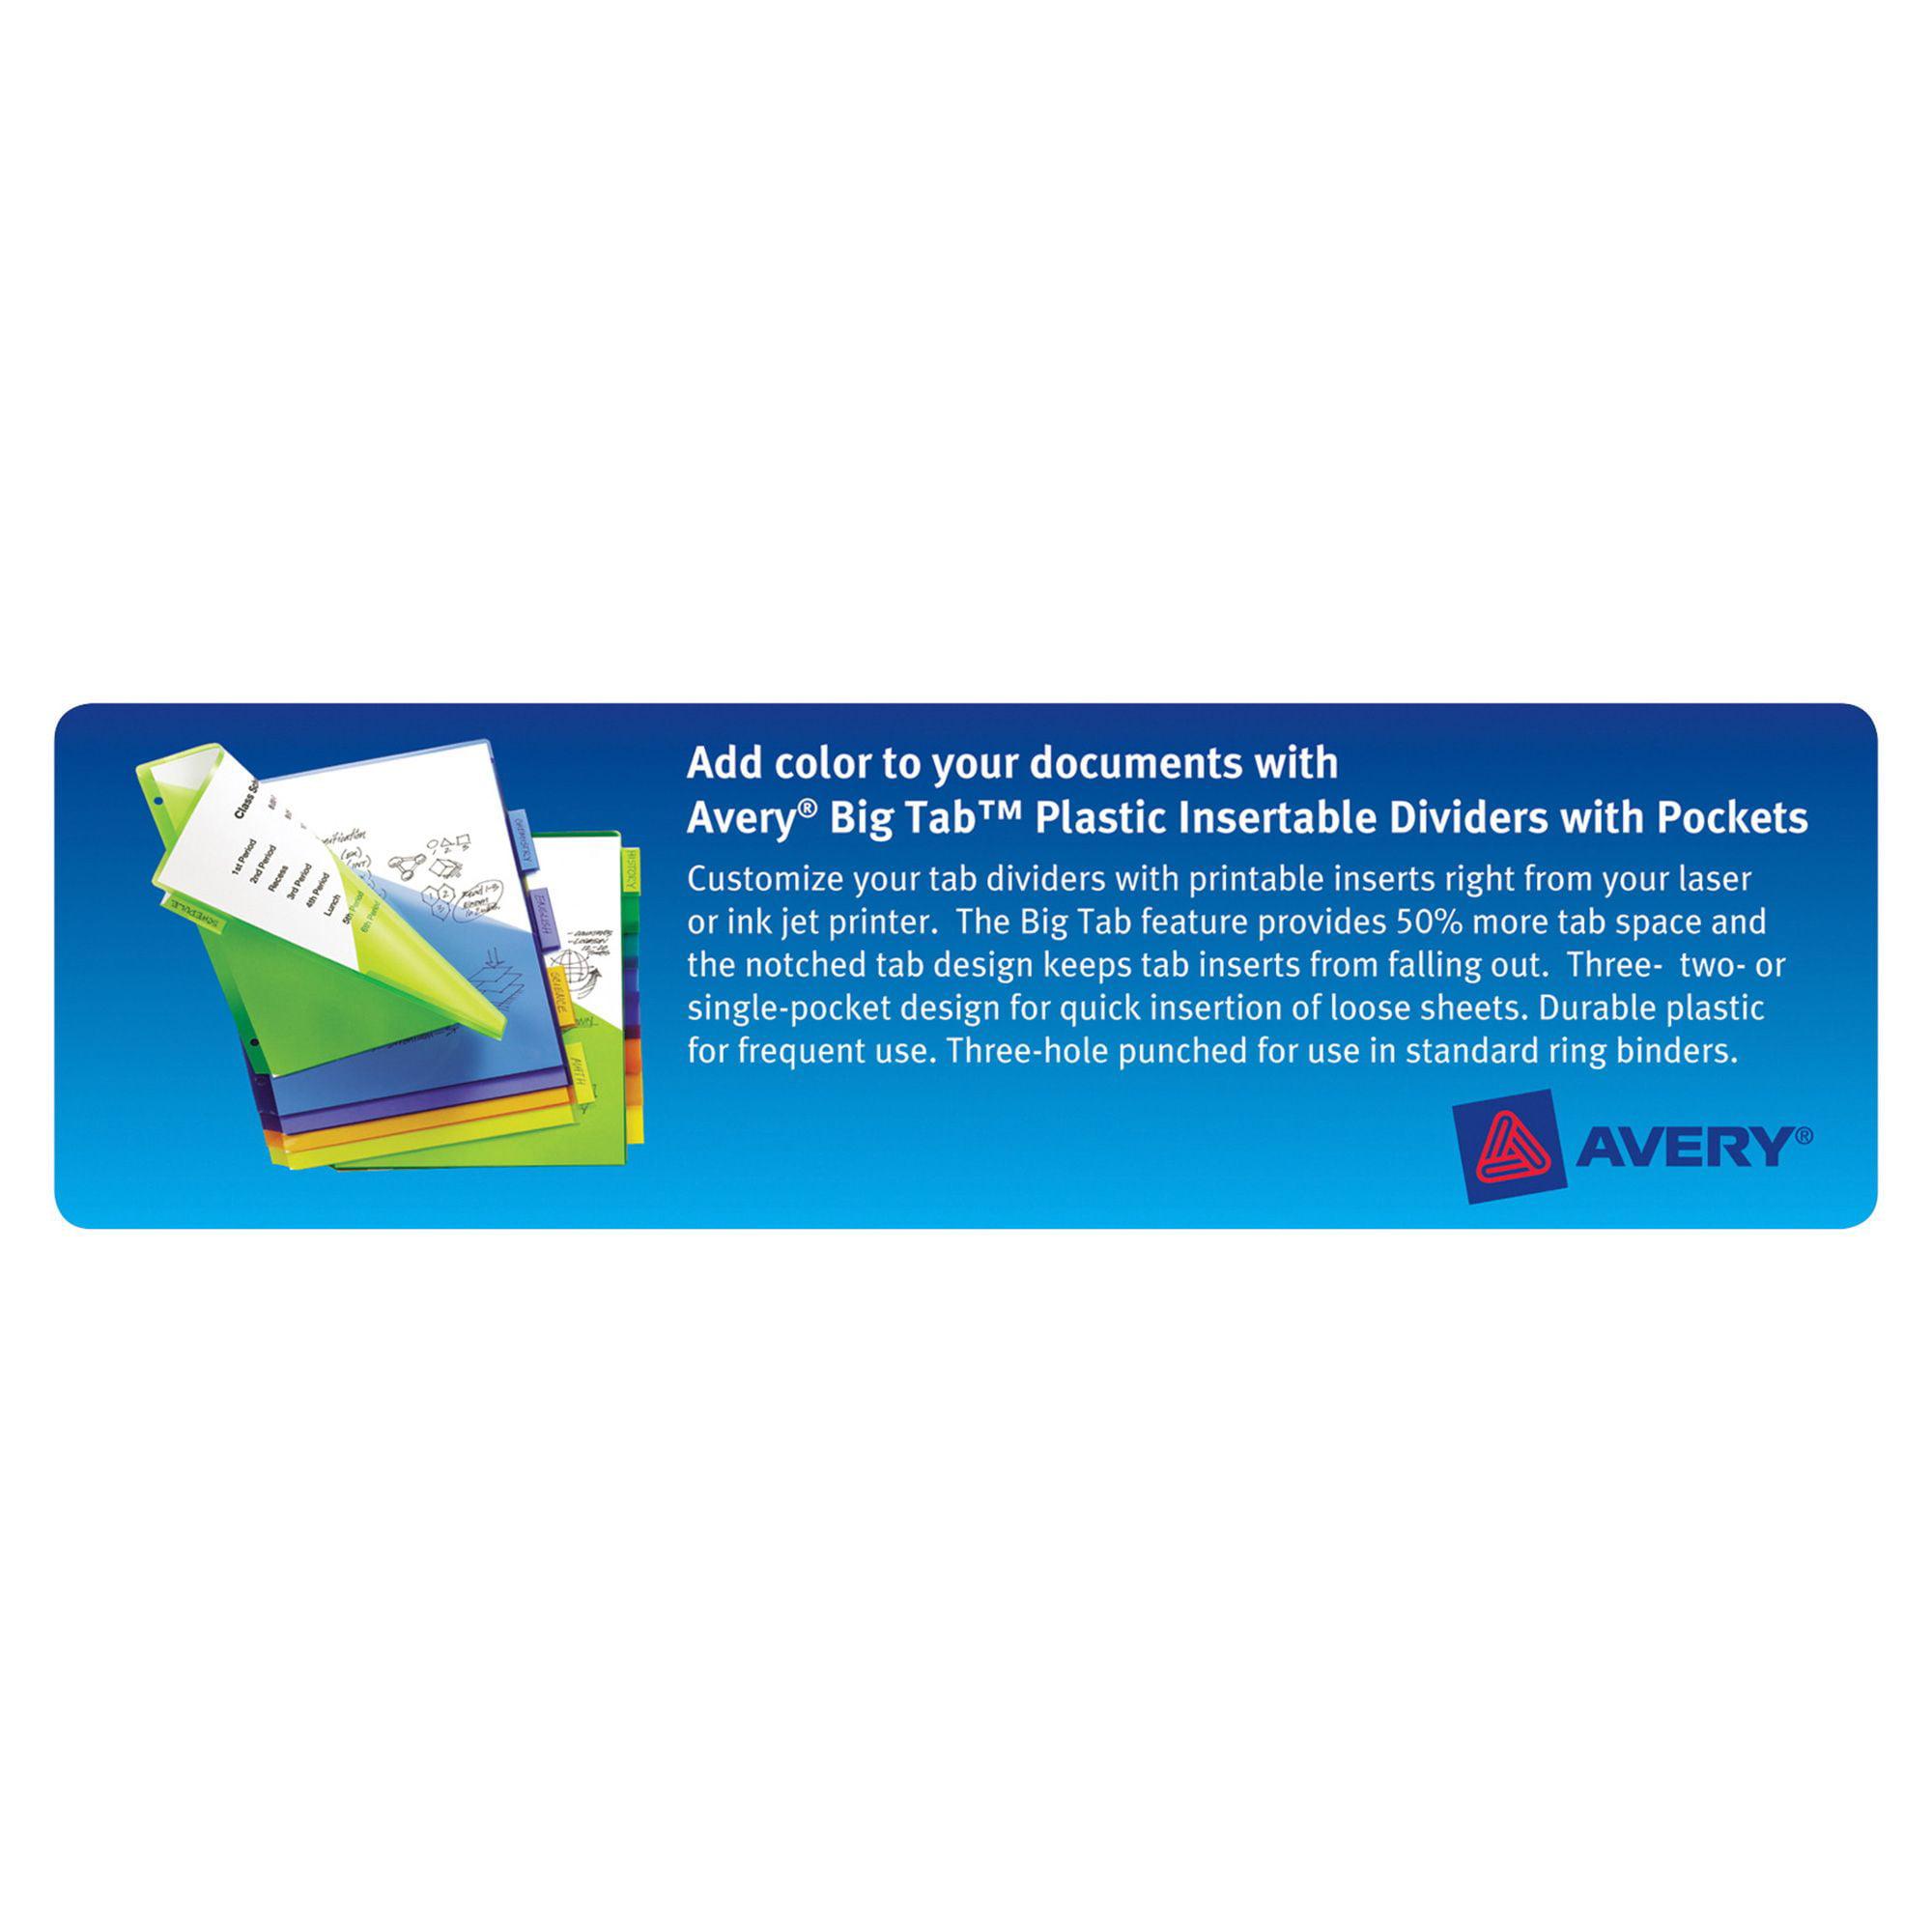 Avery Insertable Big Tab Plastic Dividers Wdouble Pockets 8 Tab